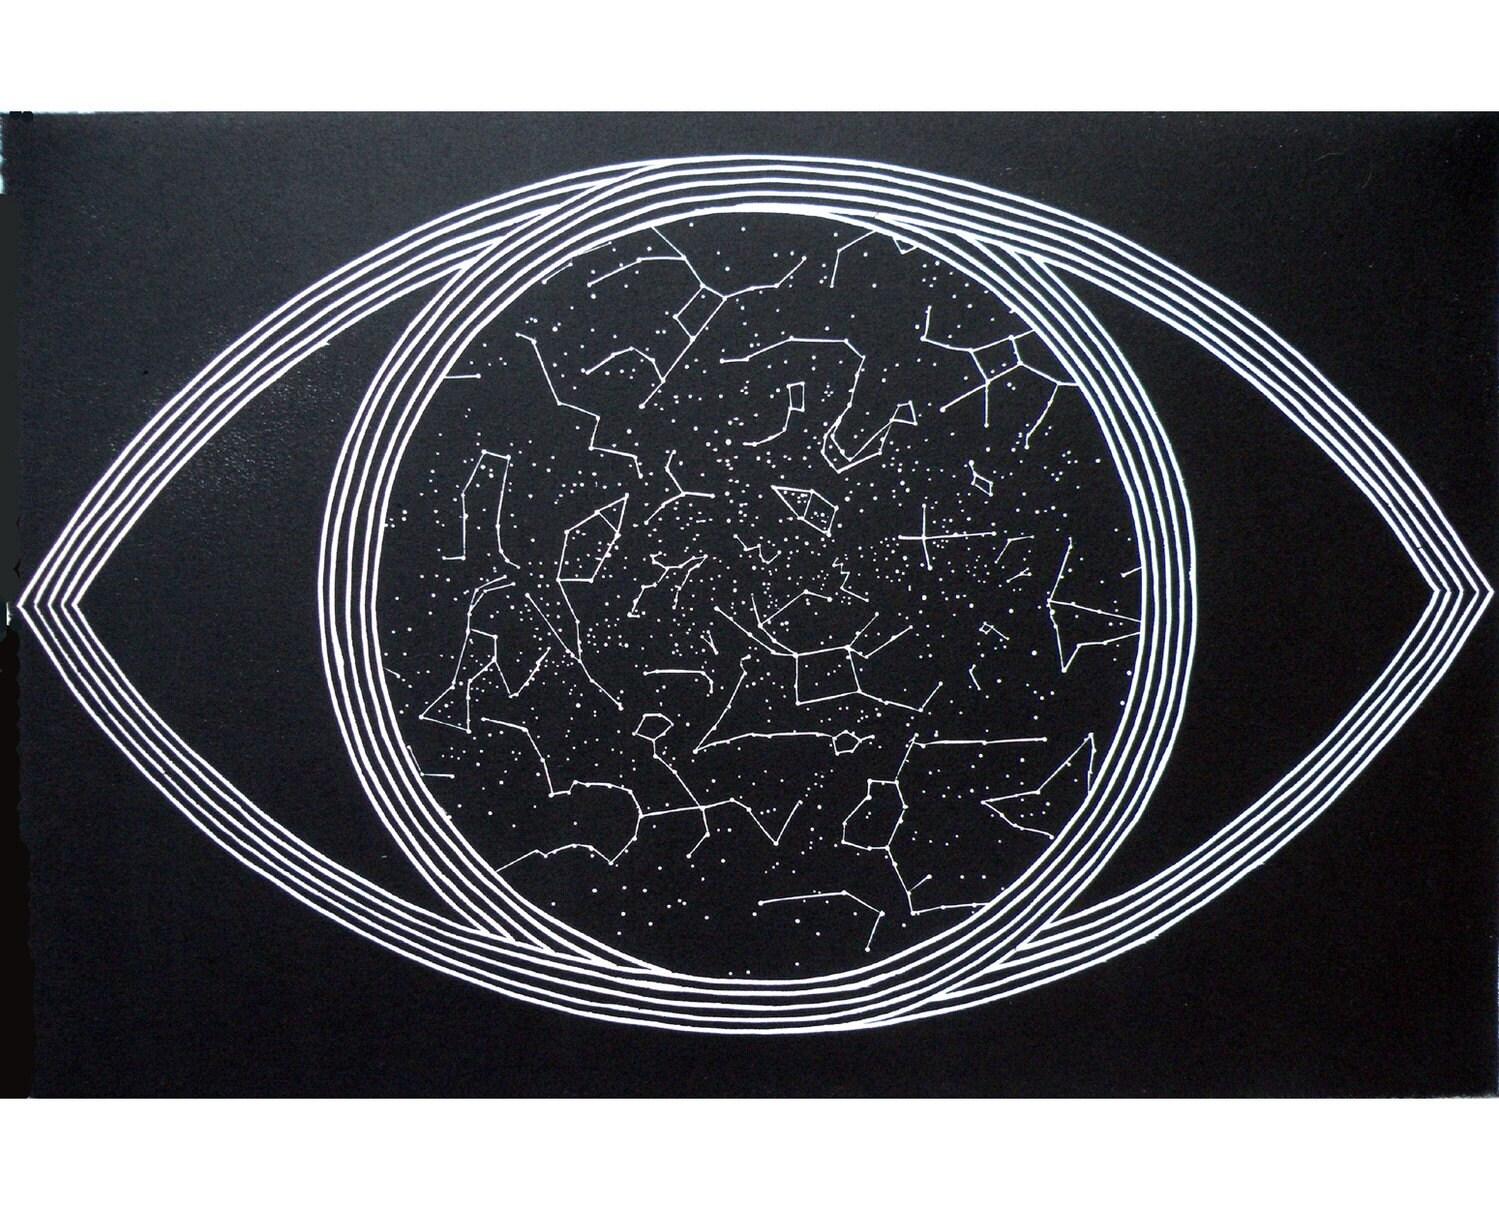 Cosmos (original woodblock print)